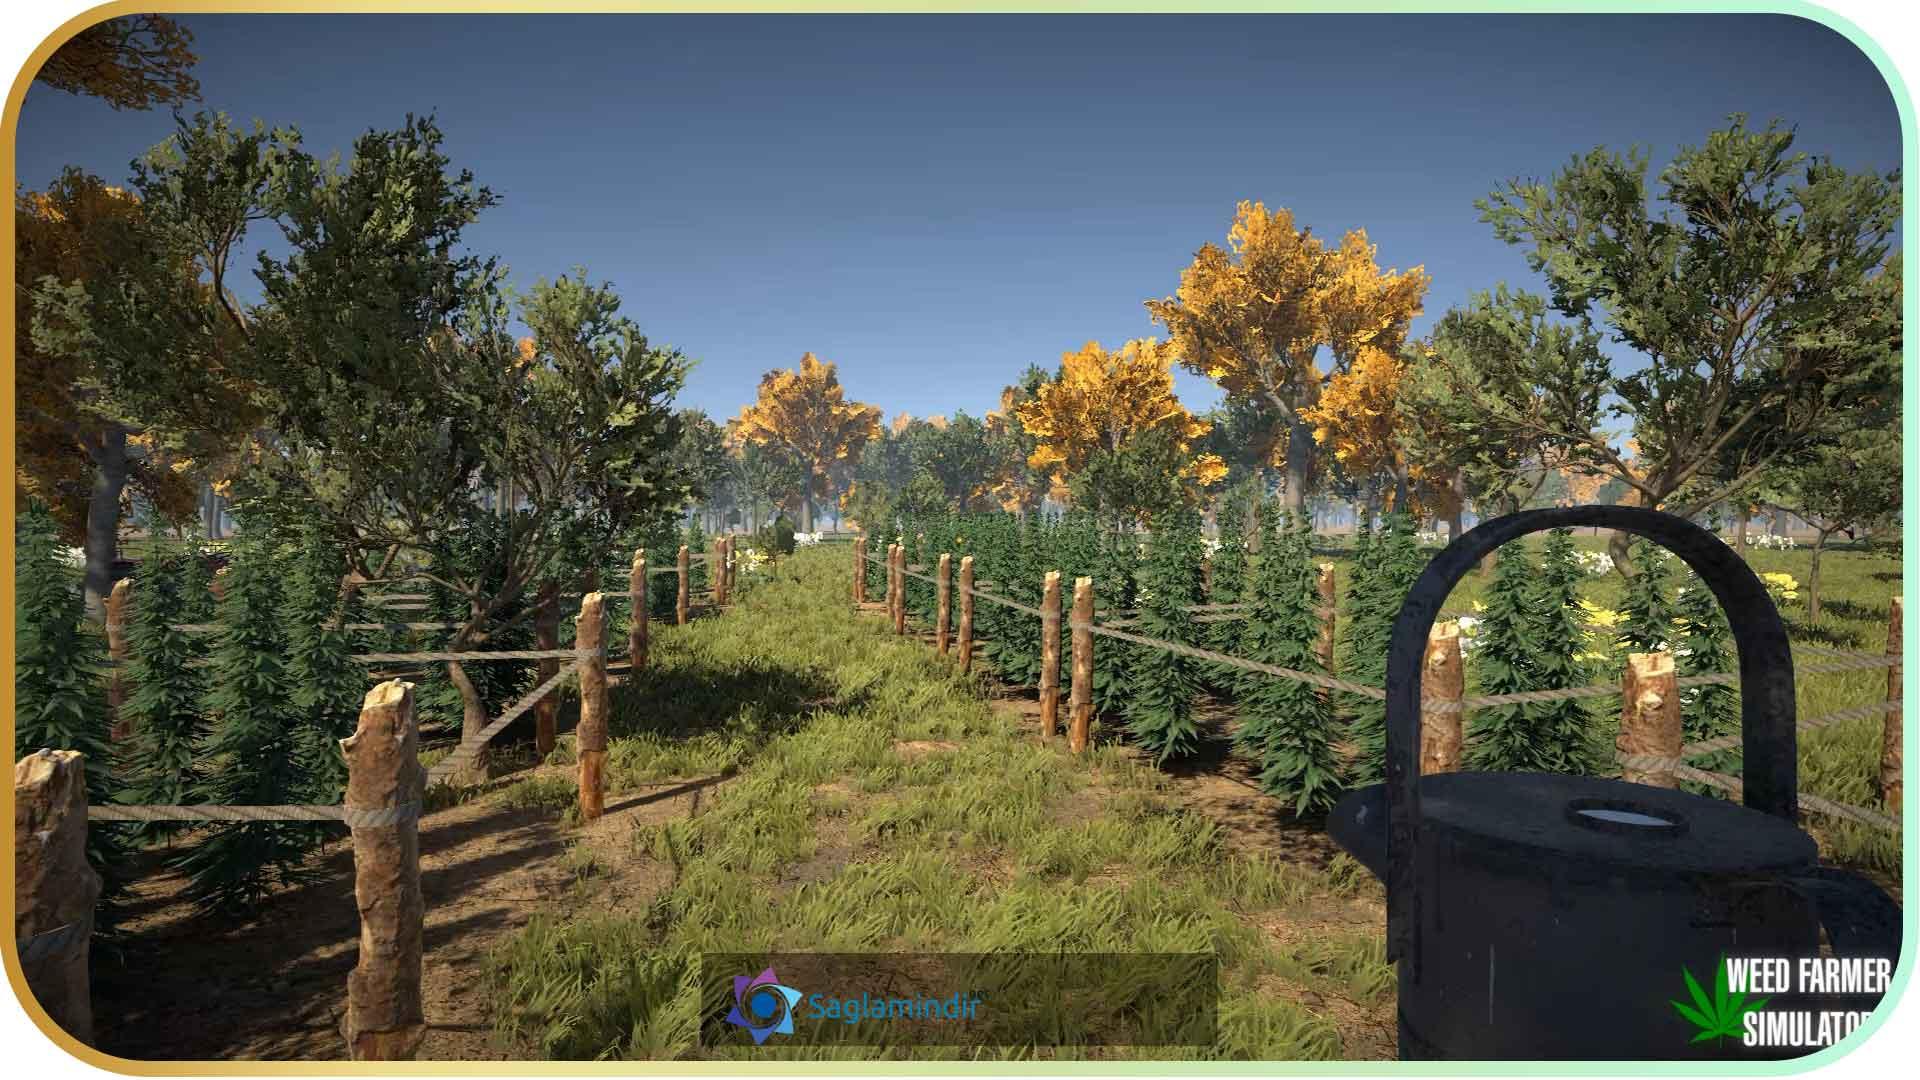 Weed Farmer Simulator saglamindir